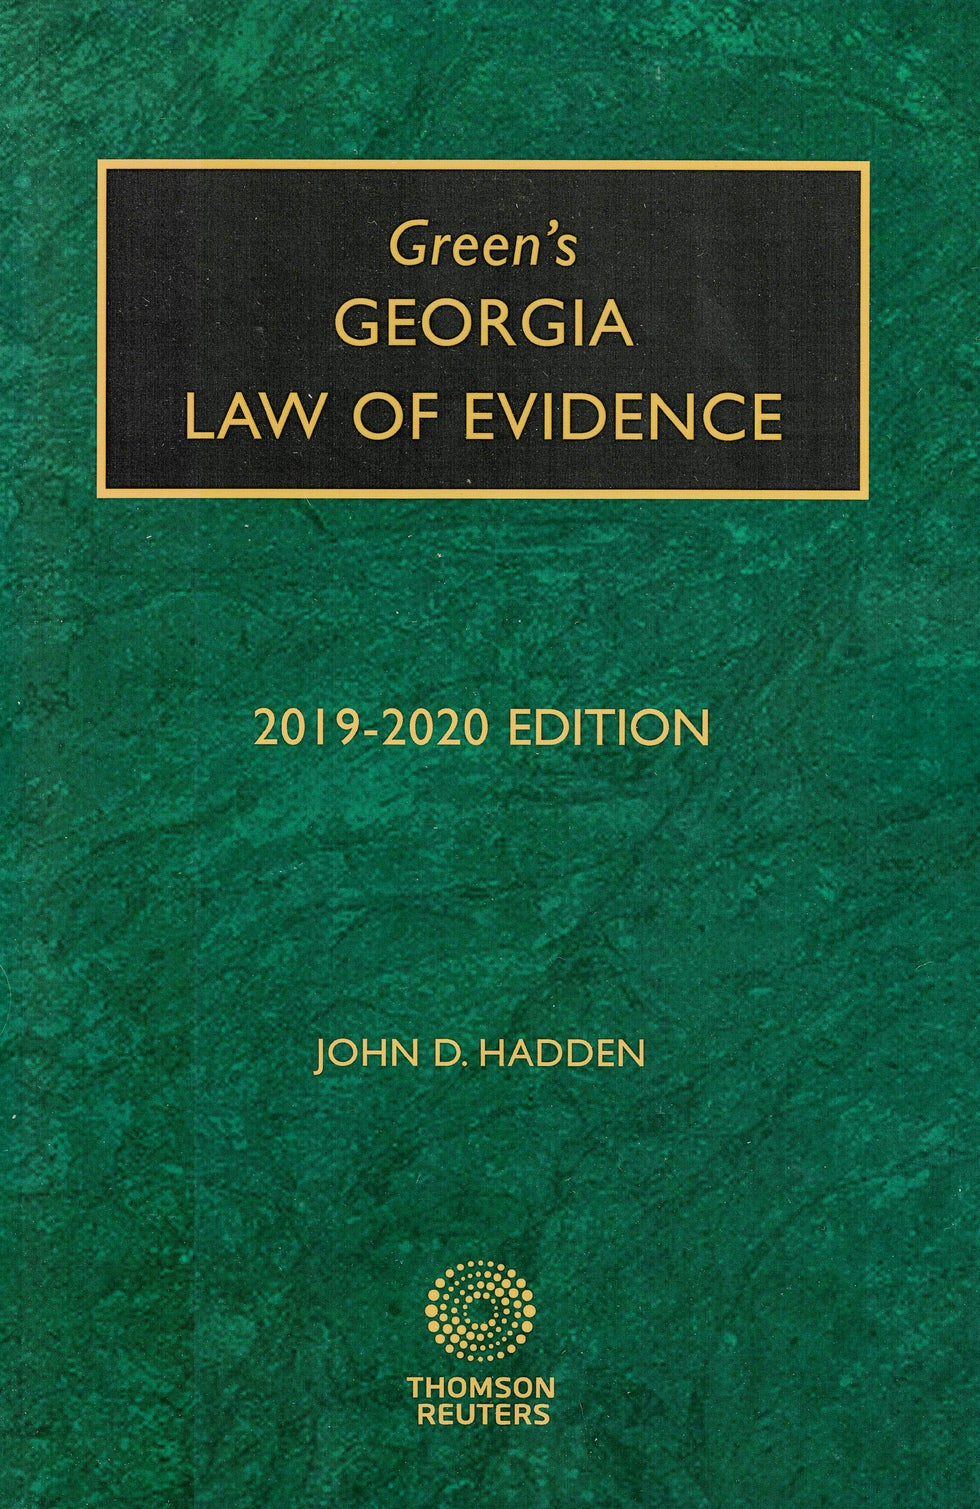 Green's Georgia Law of Evidence by John D. Hadden